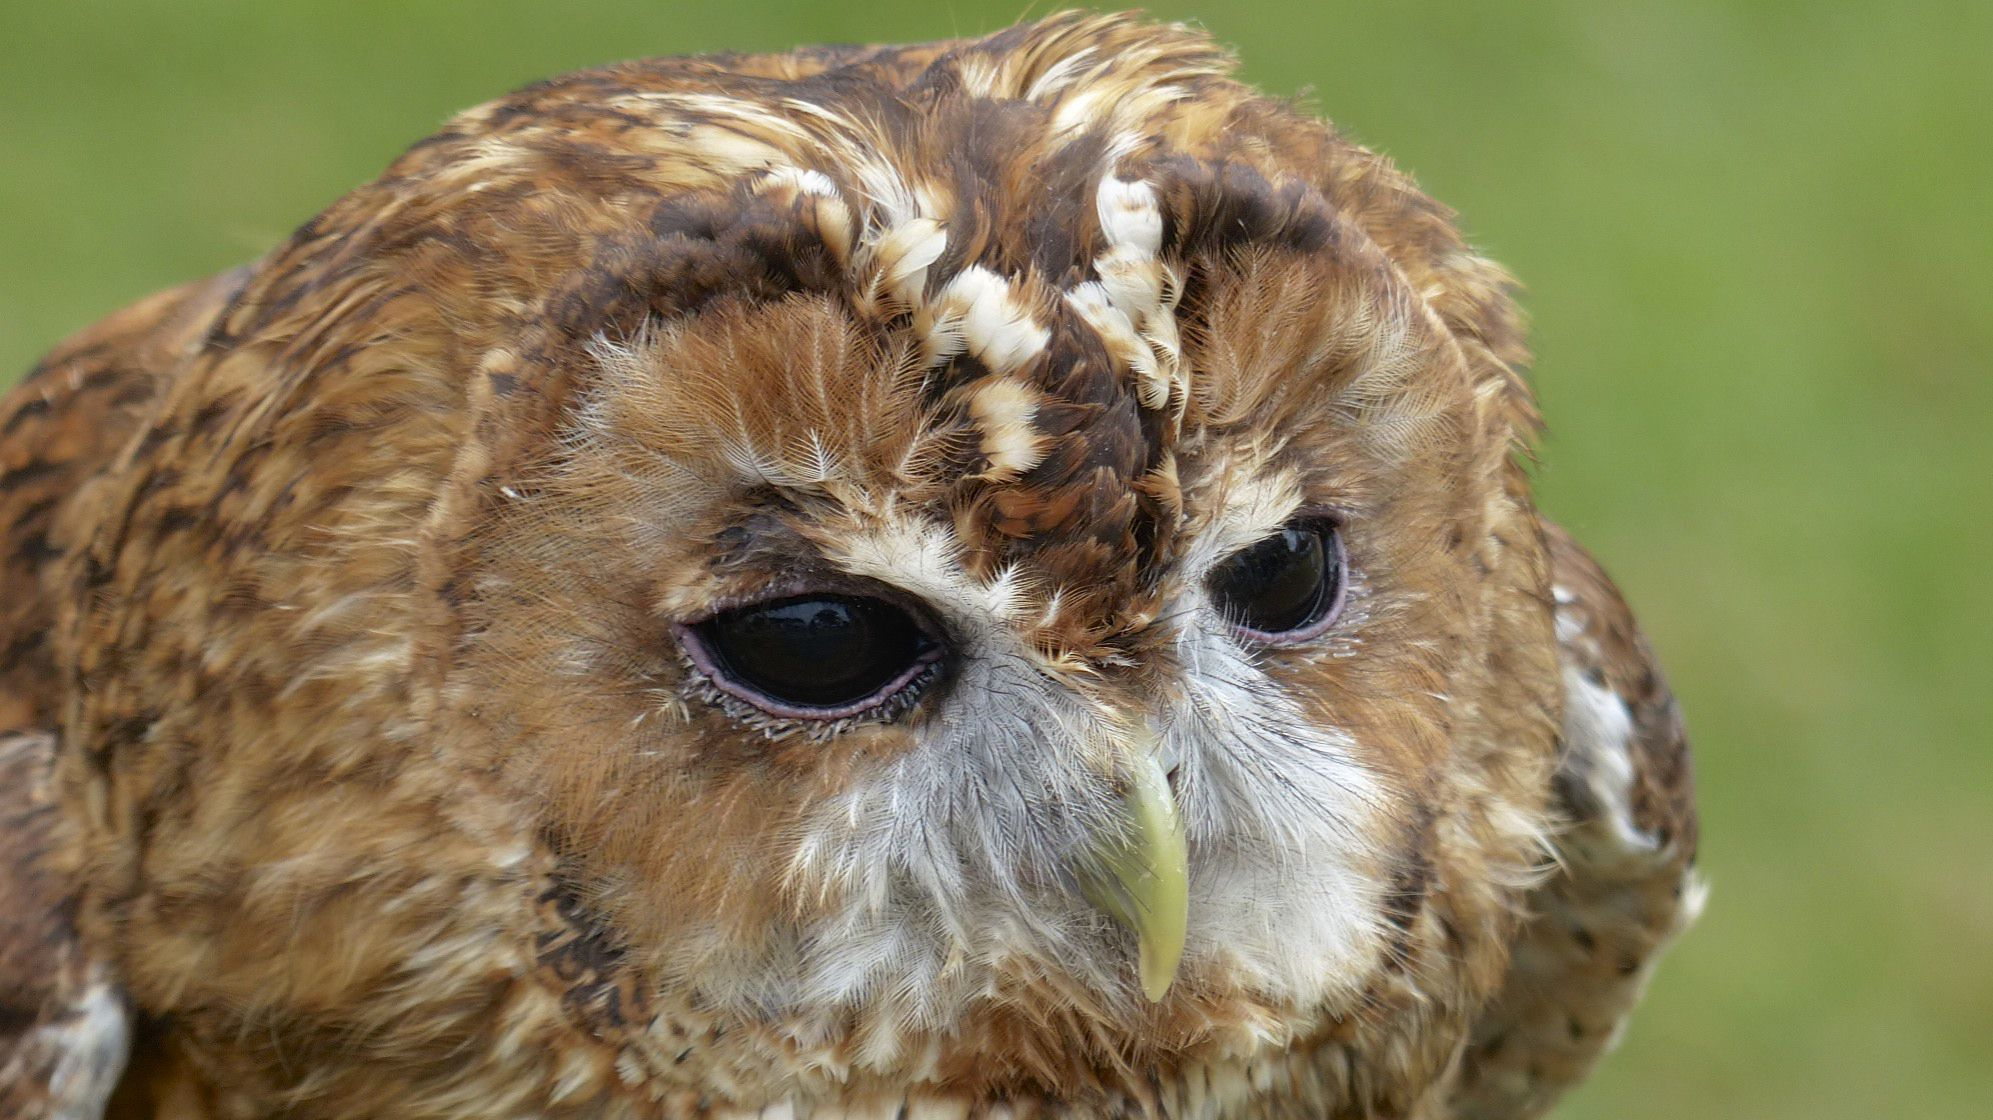 Tawny Owl 4k